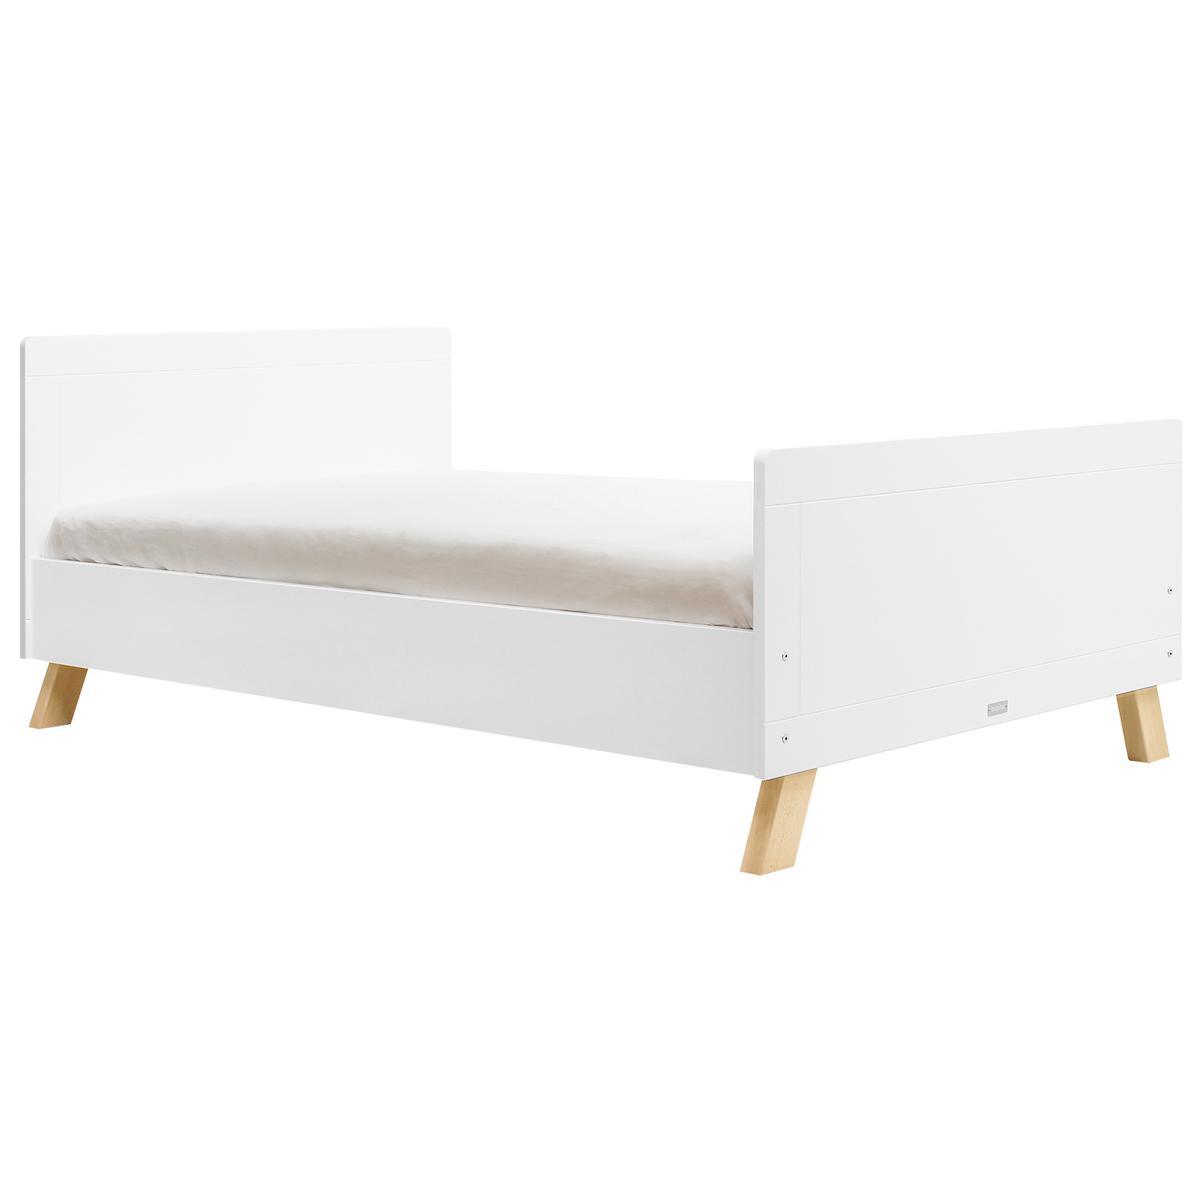 Cama 120x200cm LISA Bopita blanco-natural